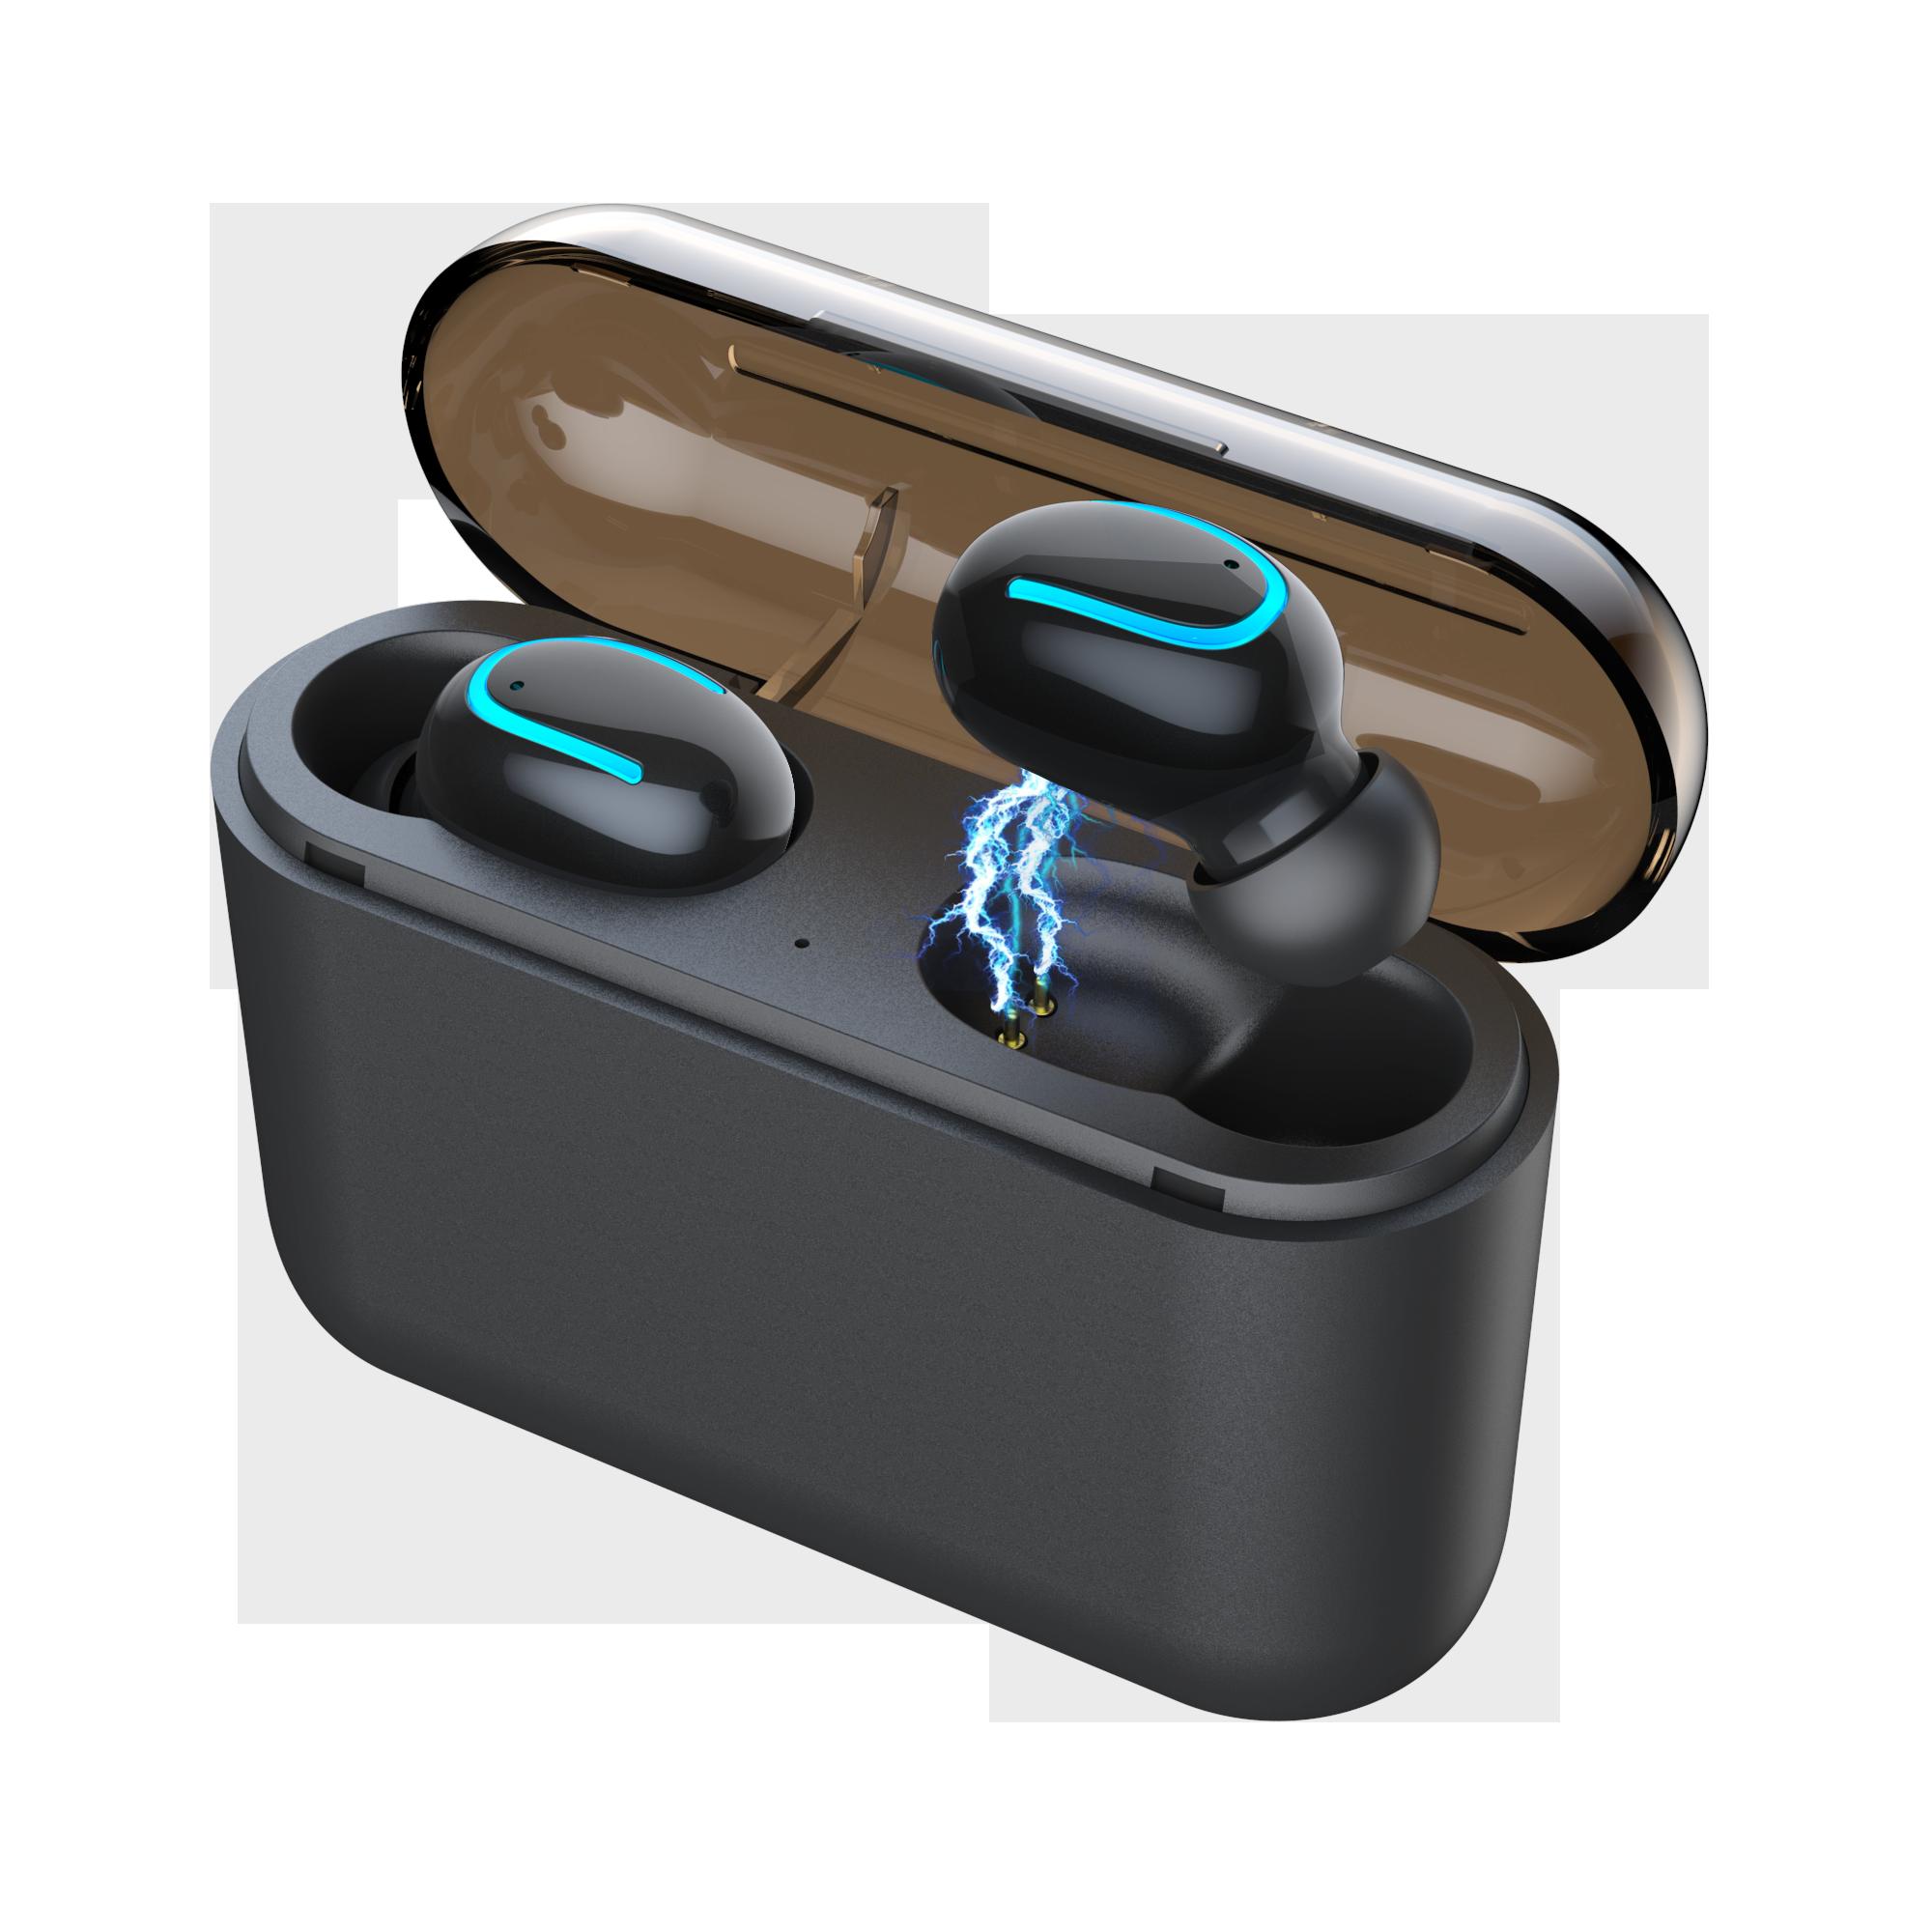 Free Shipping 2020 Original Q32 TWS Mini Wireless bests headphones Blue tooth Headset gaming headset i9s i18 i20